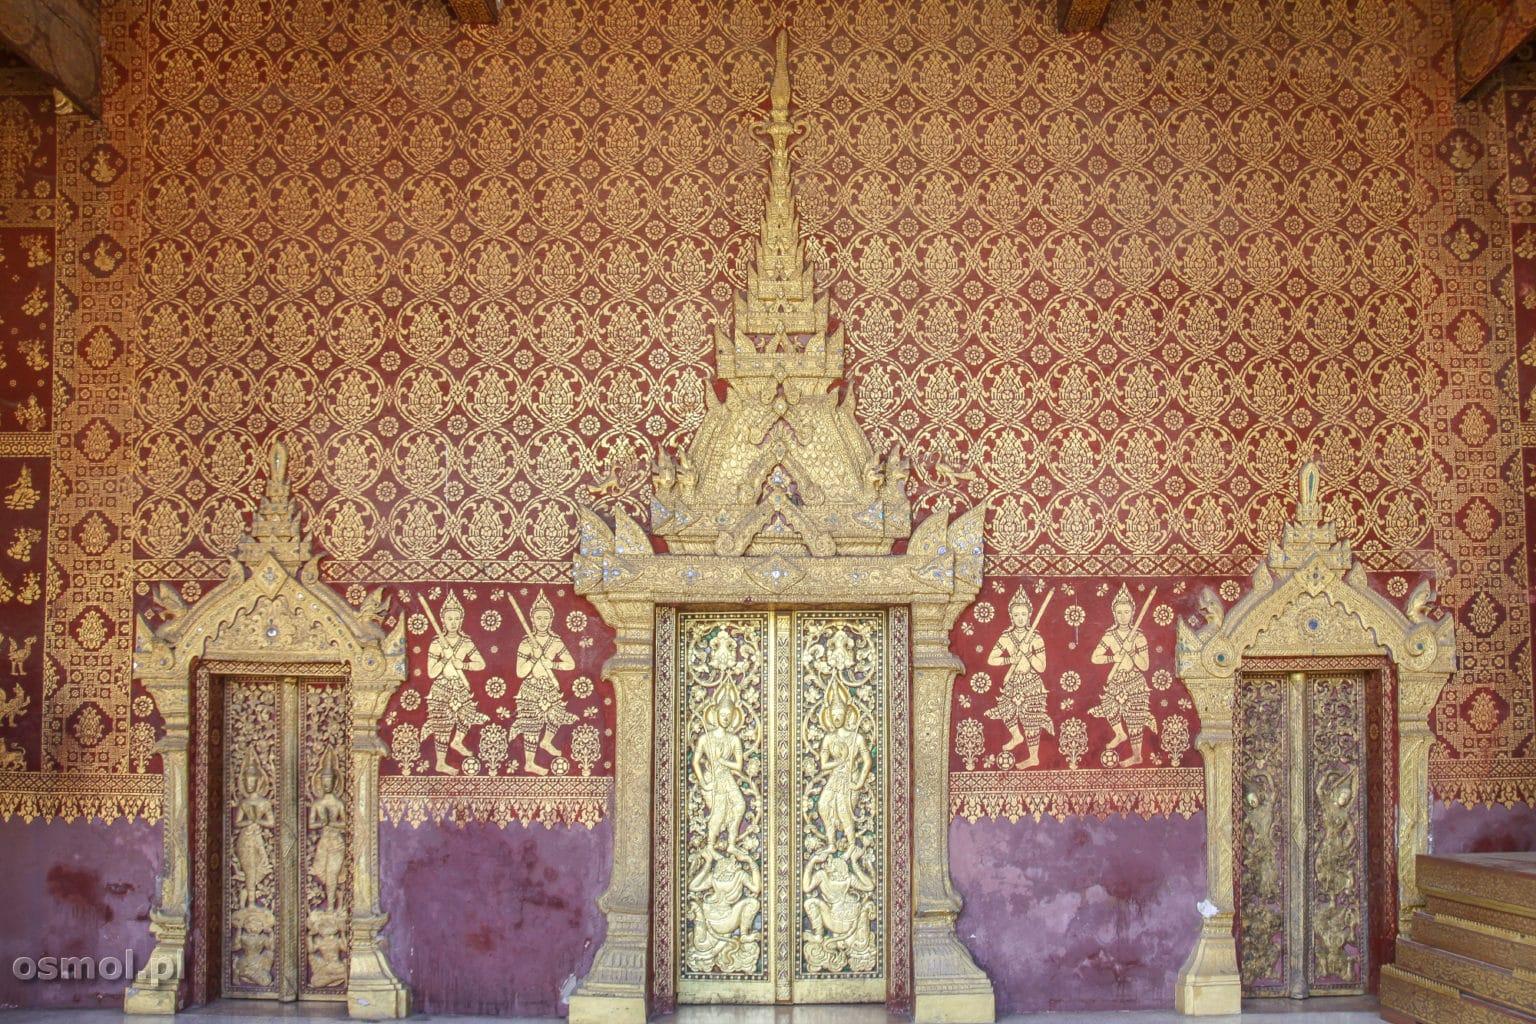 Wzory na świątyni w Luang Prabang